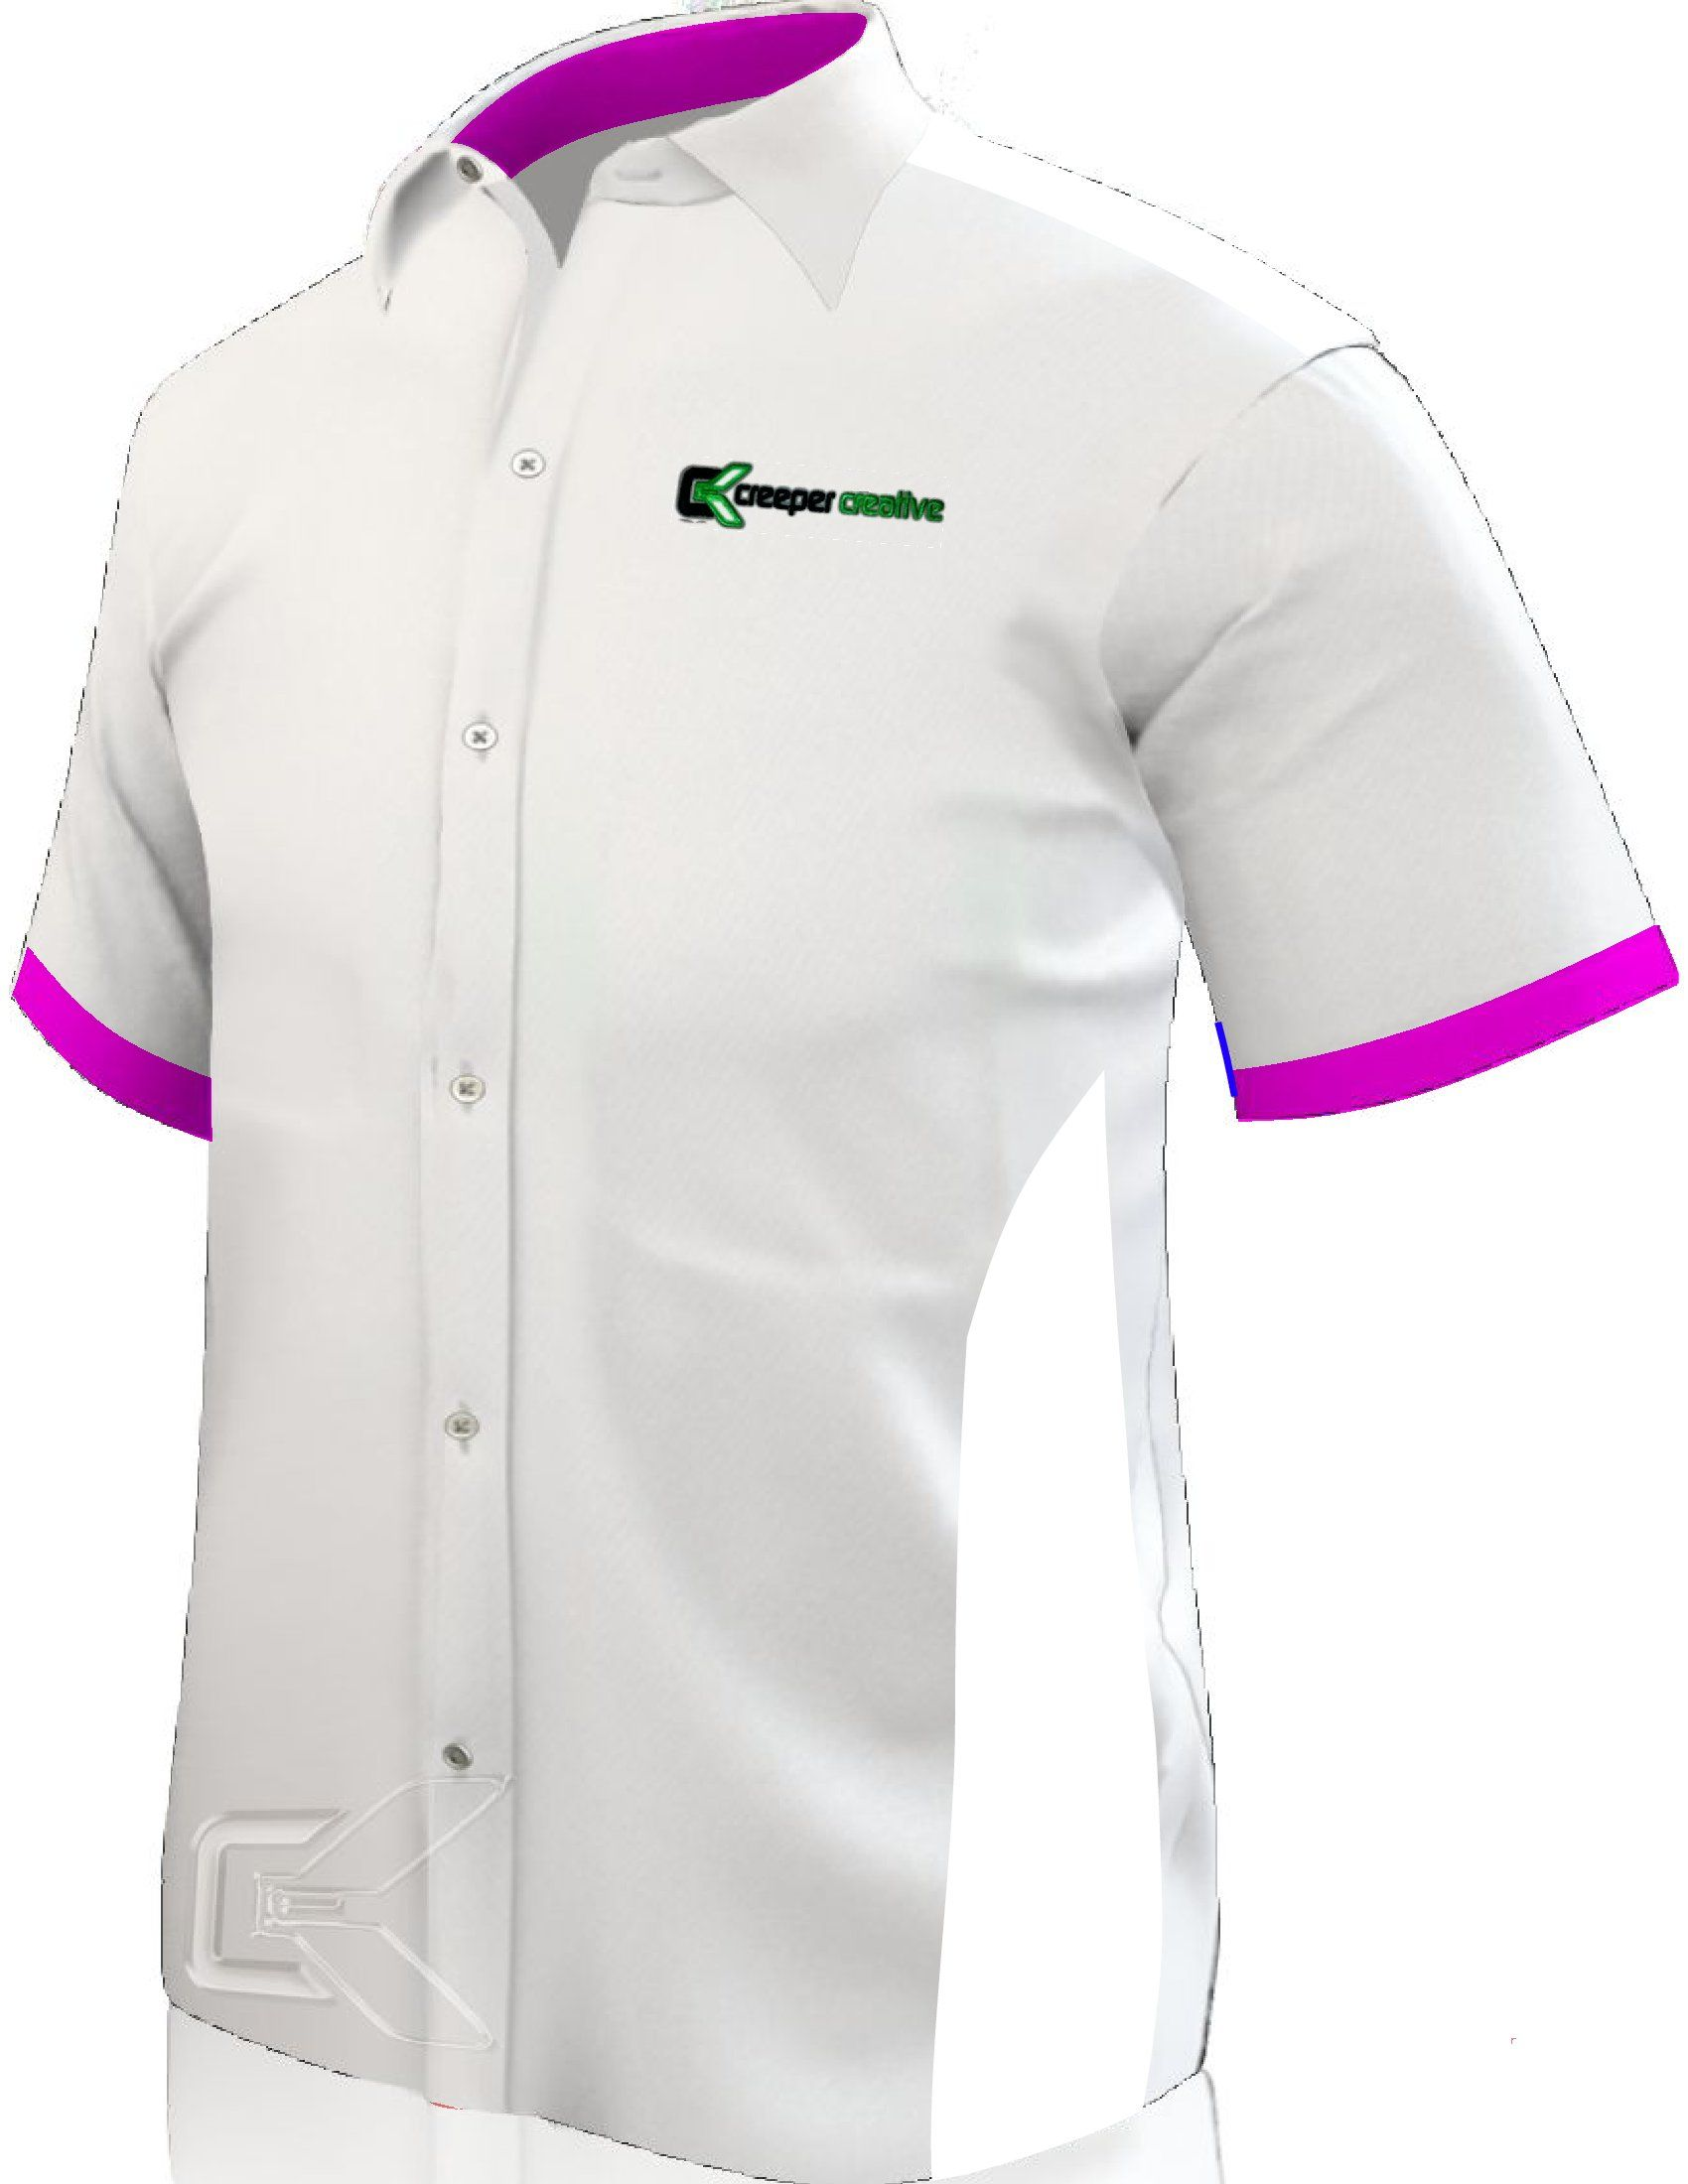 Creeper Creative ® Original Uniform 03 6143 5225